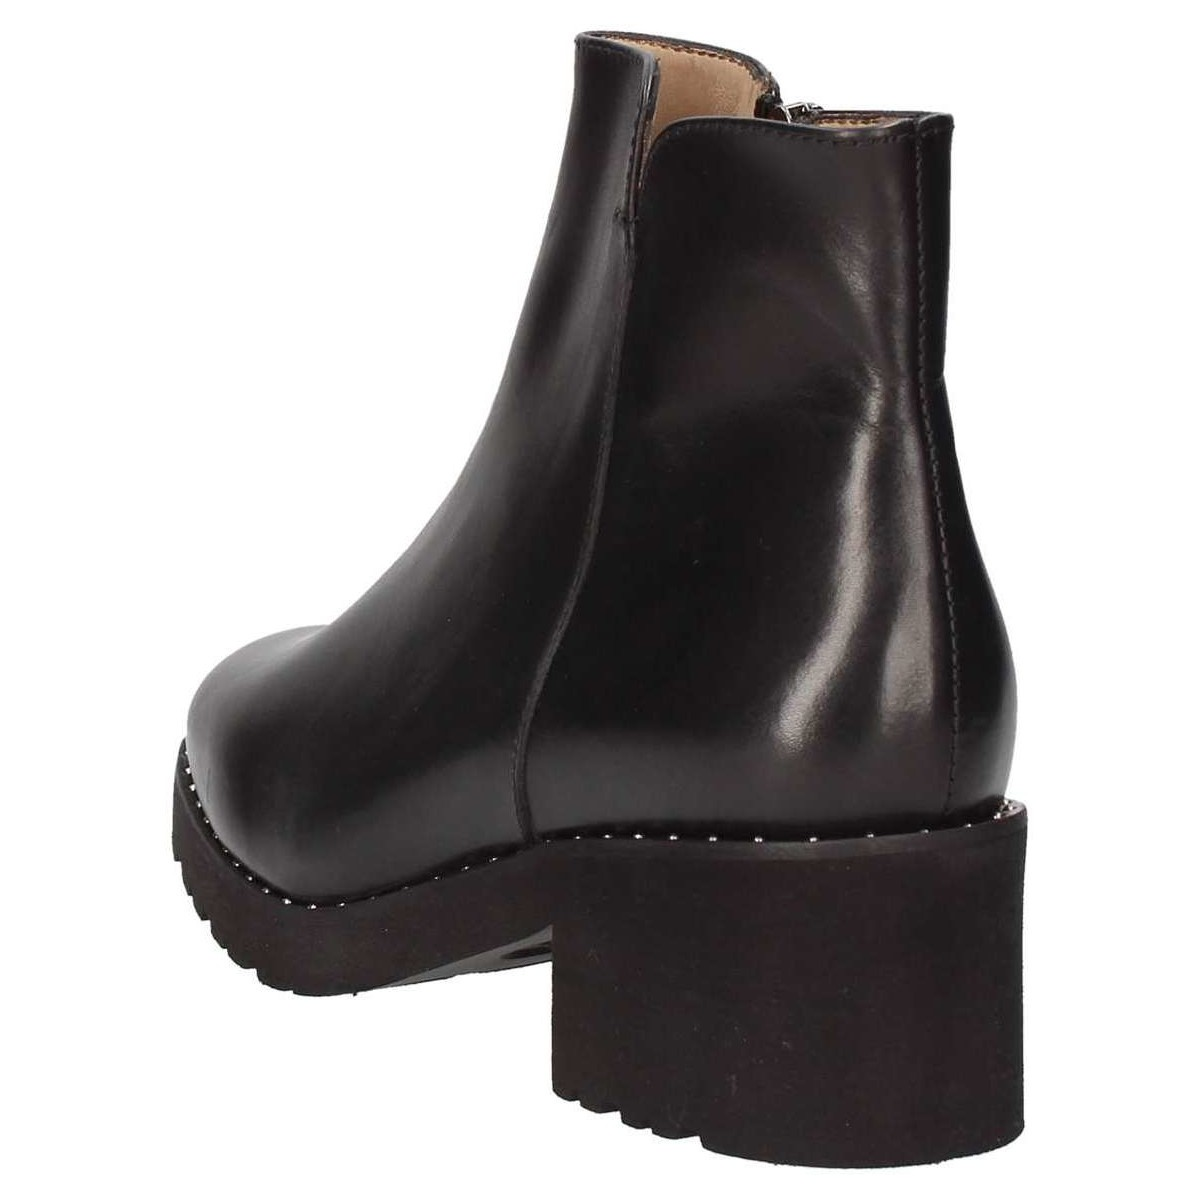 Dt306 Boots Calpierre Calpierre Boots Calpierre Calpierre Calpierre Dt306 Dt306 Boots Boots Dt306 ucF5Tl3K1J